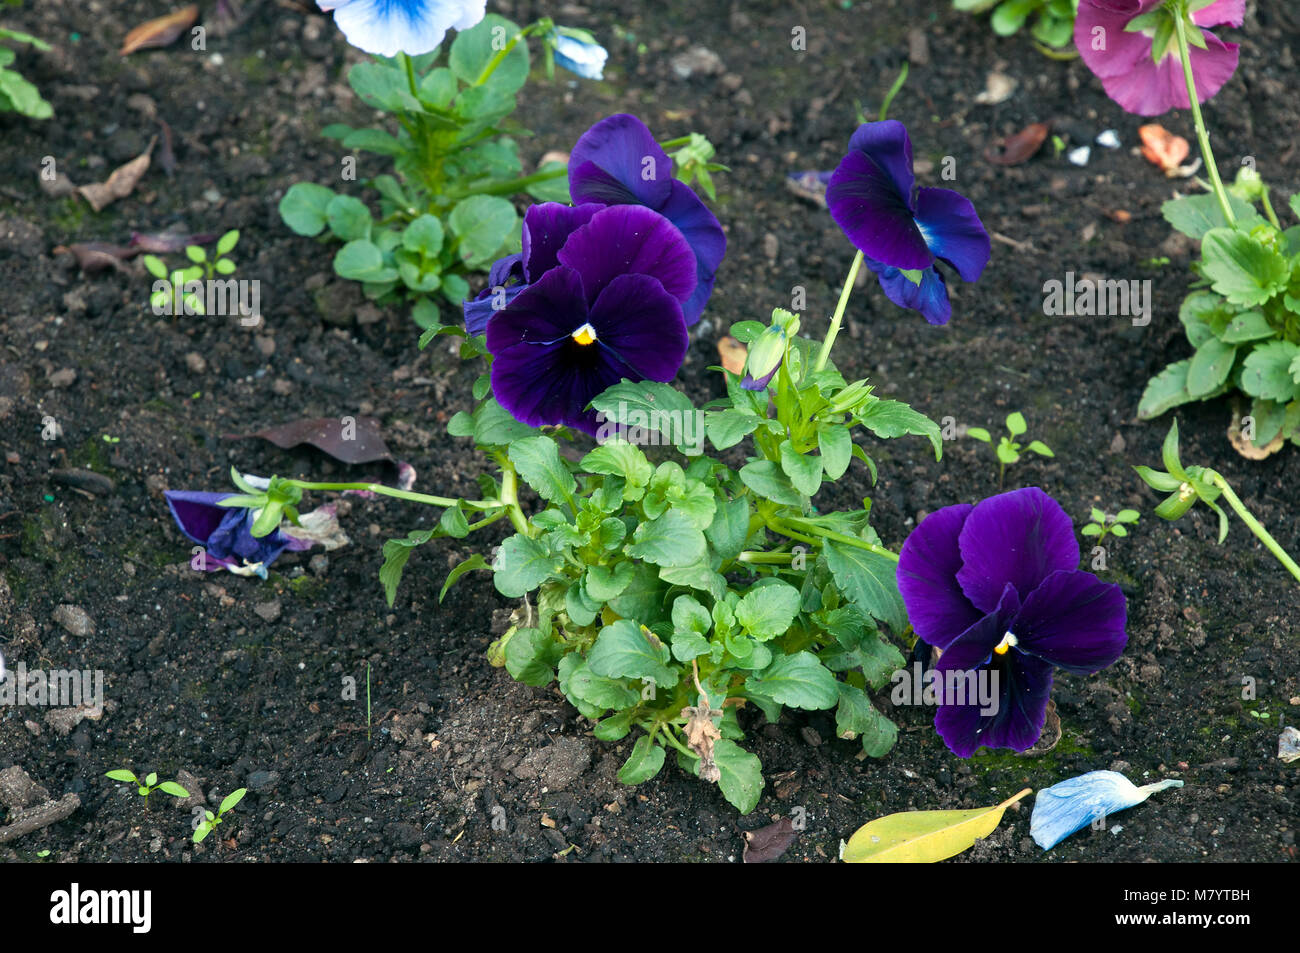 Sydney Australia, flowerbed with dark purple pansies Stock Photo